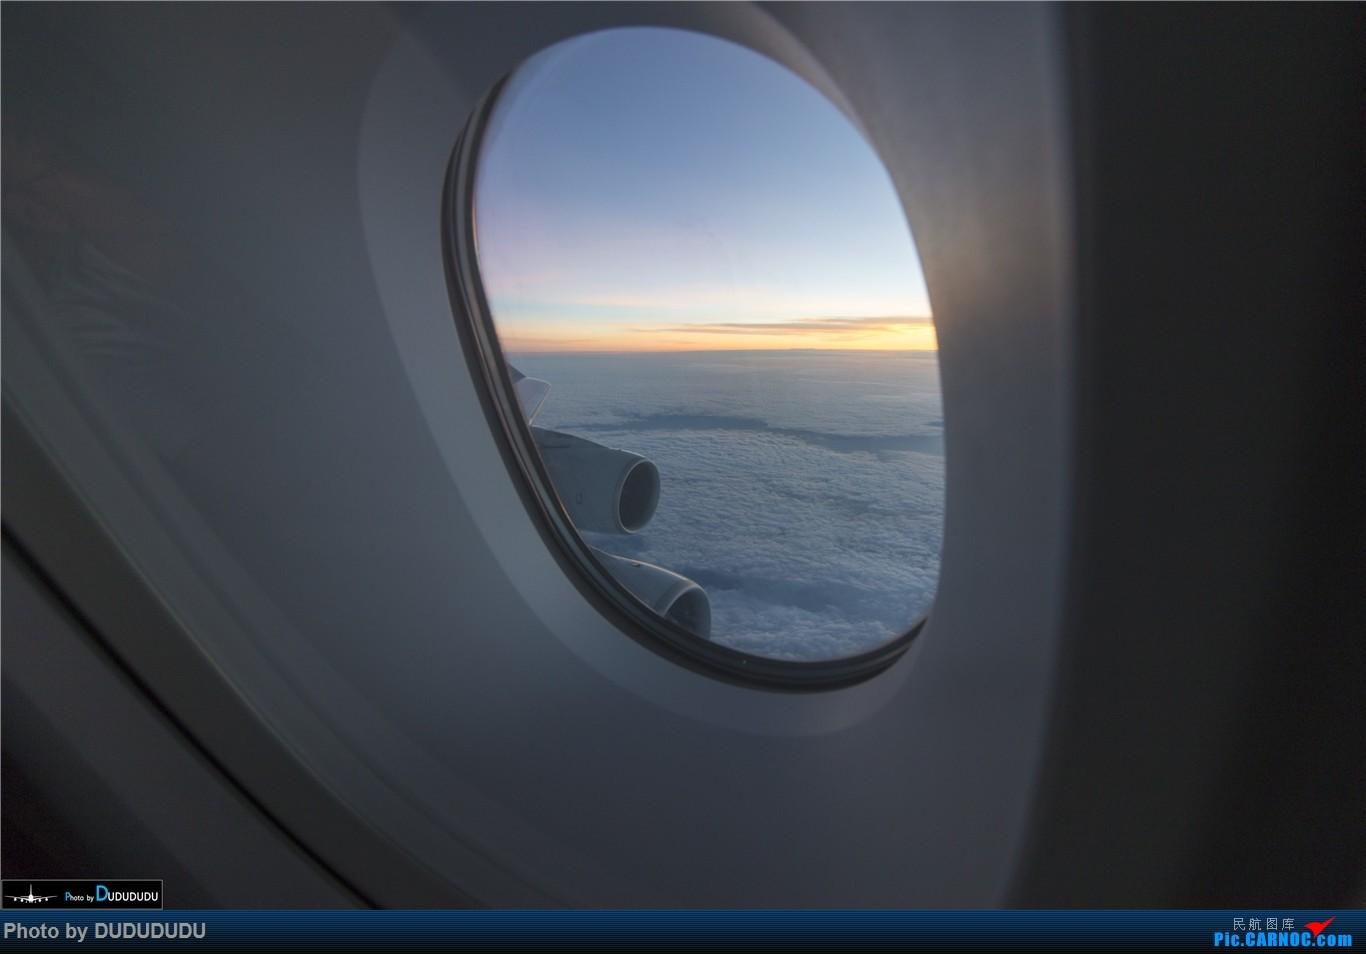 Re:[原创]【DUDUDUDU】暑期飞行合集 从A388到MA60 AIRBUS A380 B-6140 中国广州白云国际机场